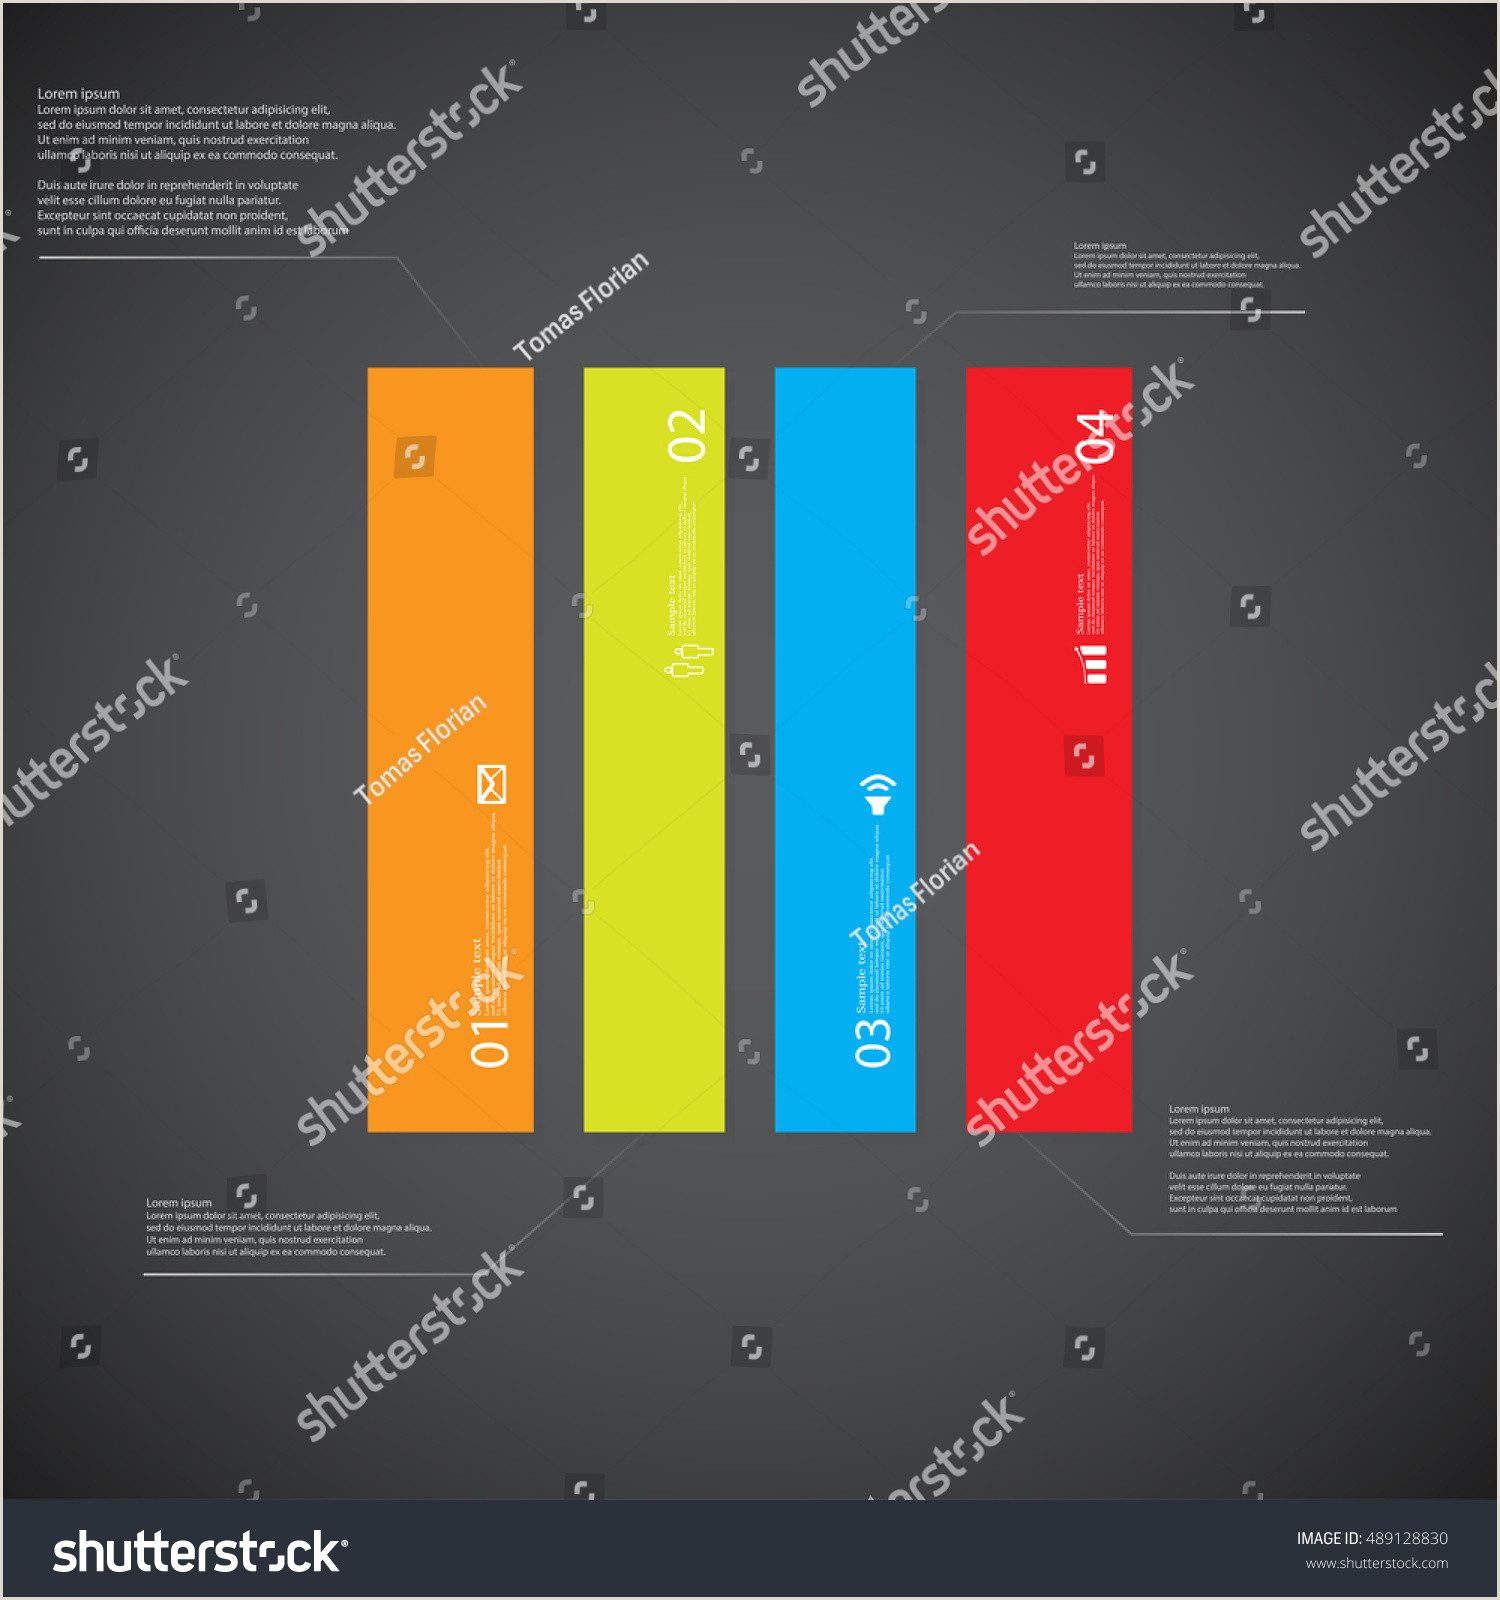 Illustration Infographic Template Shape Rectangle Square